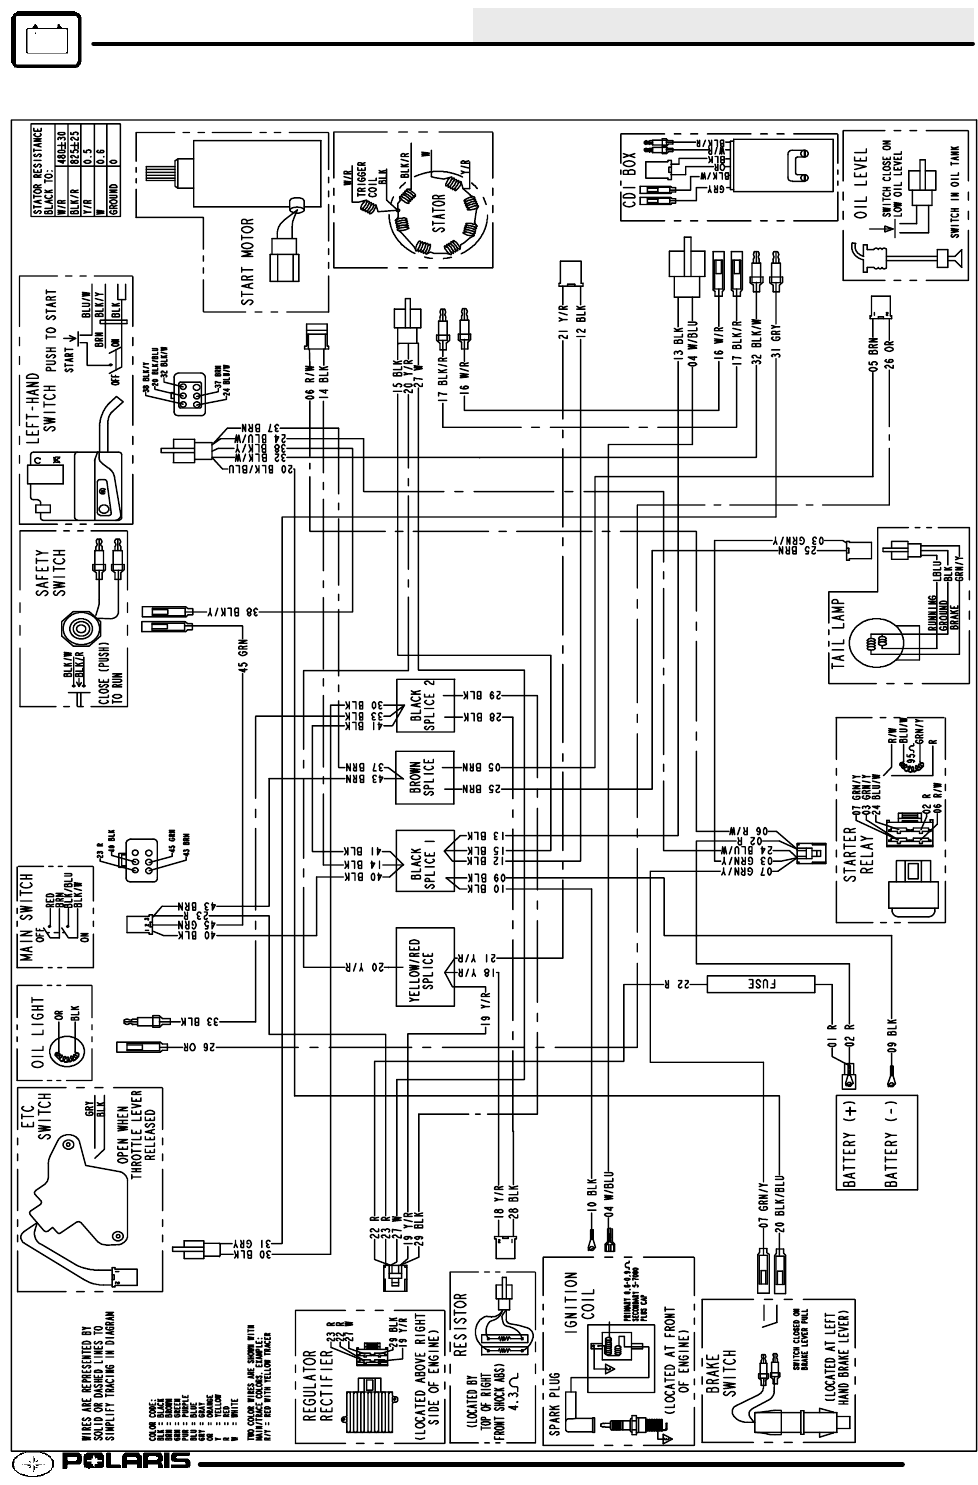 diagram] ktm 525 exc wiring diagram full version hd quality wiring diagram  - beerdiagrams.saladbowl.fr  beerdiagrams.saladbowl.fr